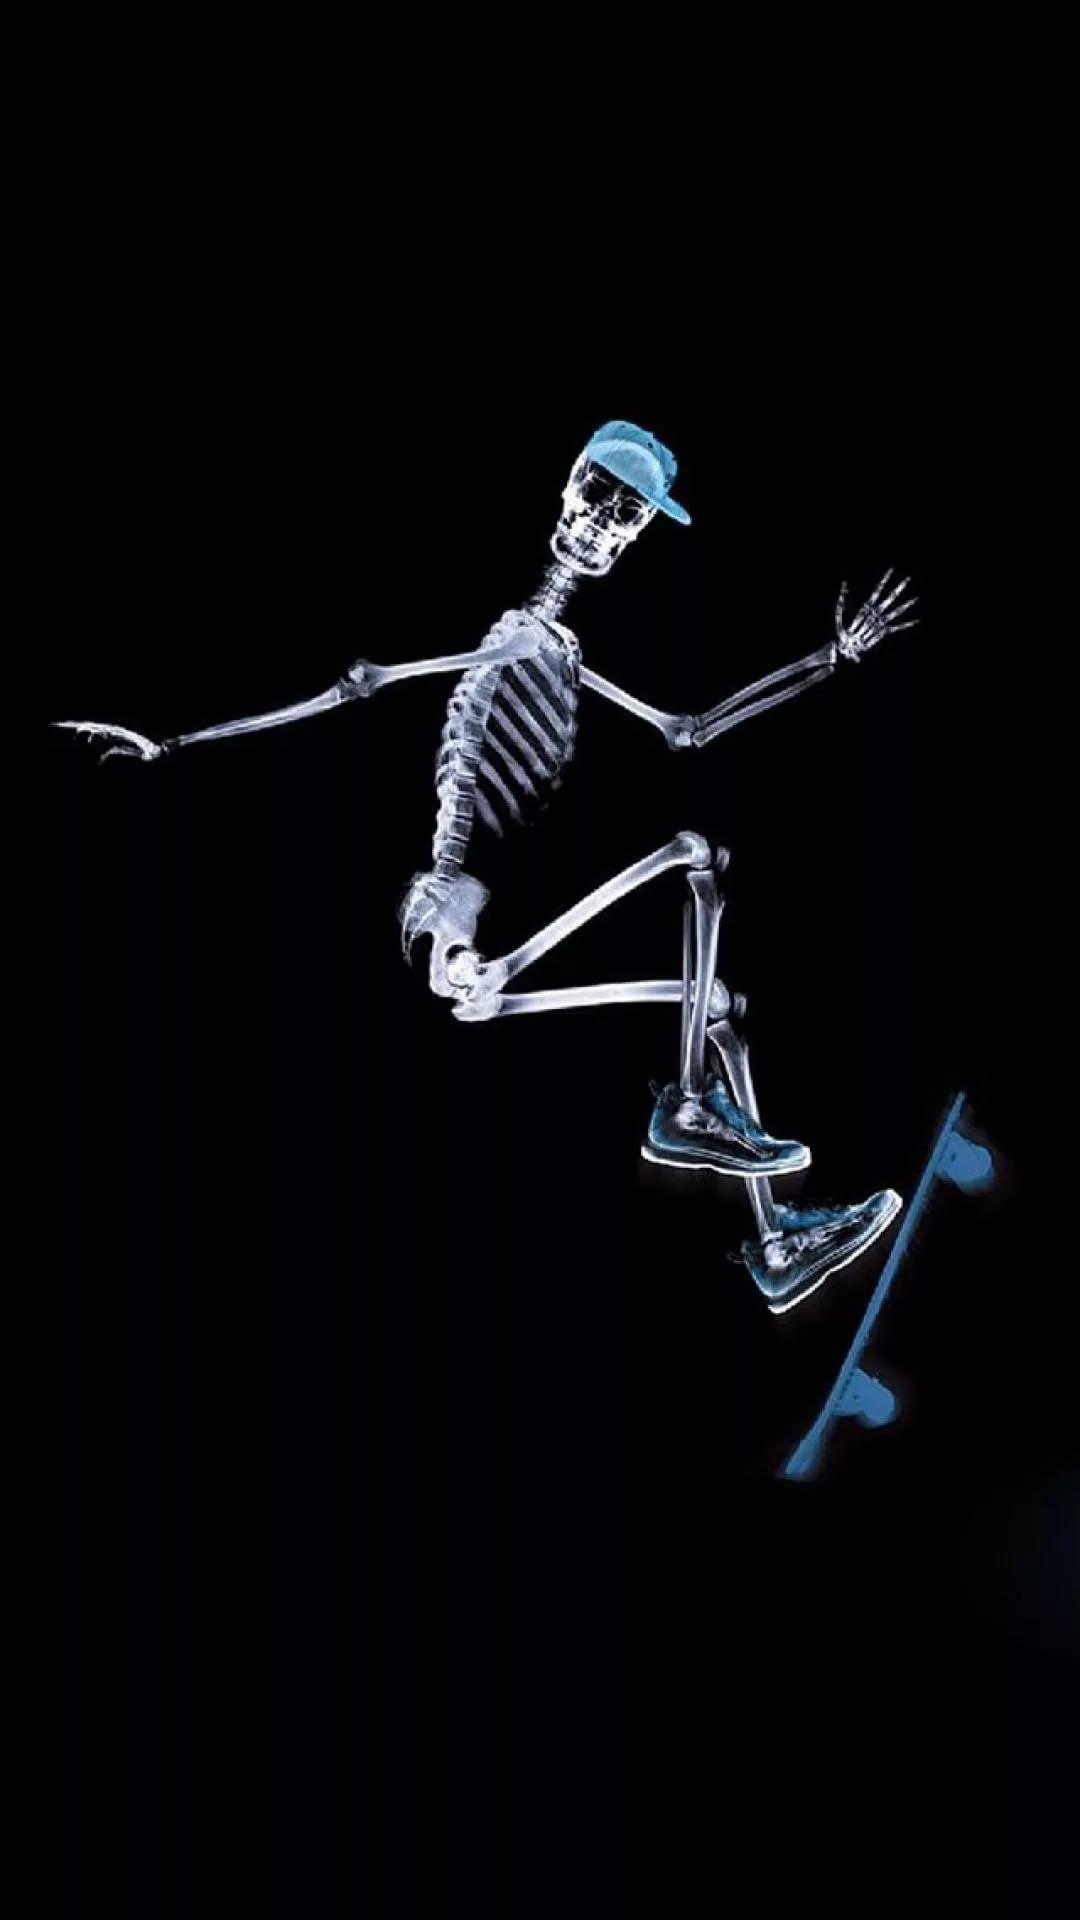 Skeleton iPhone Wallpapers (40+ images) - WallpaperBoat